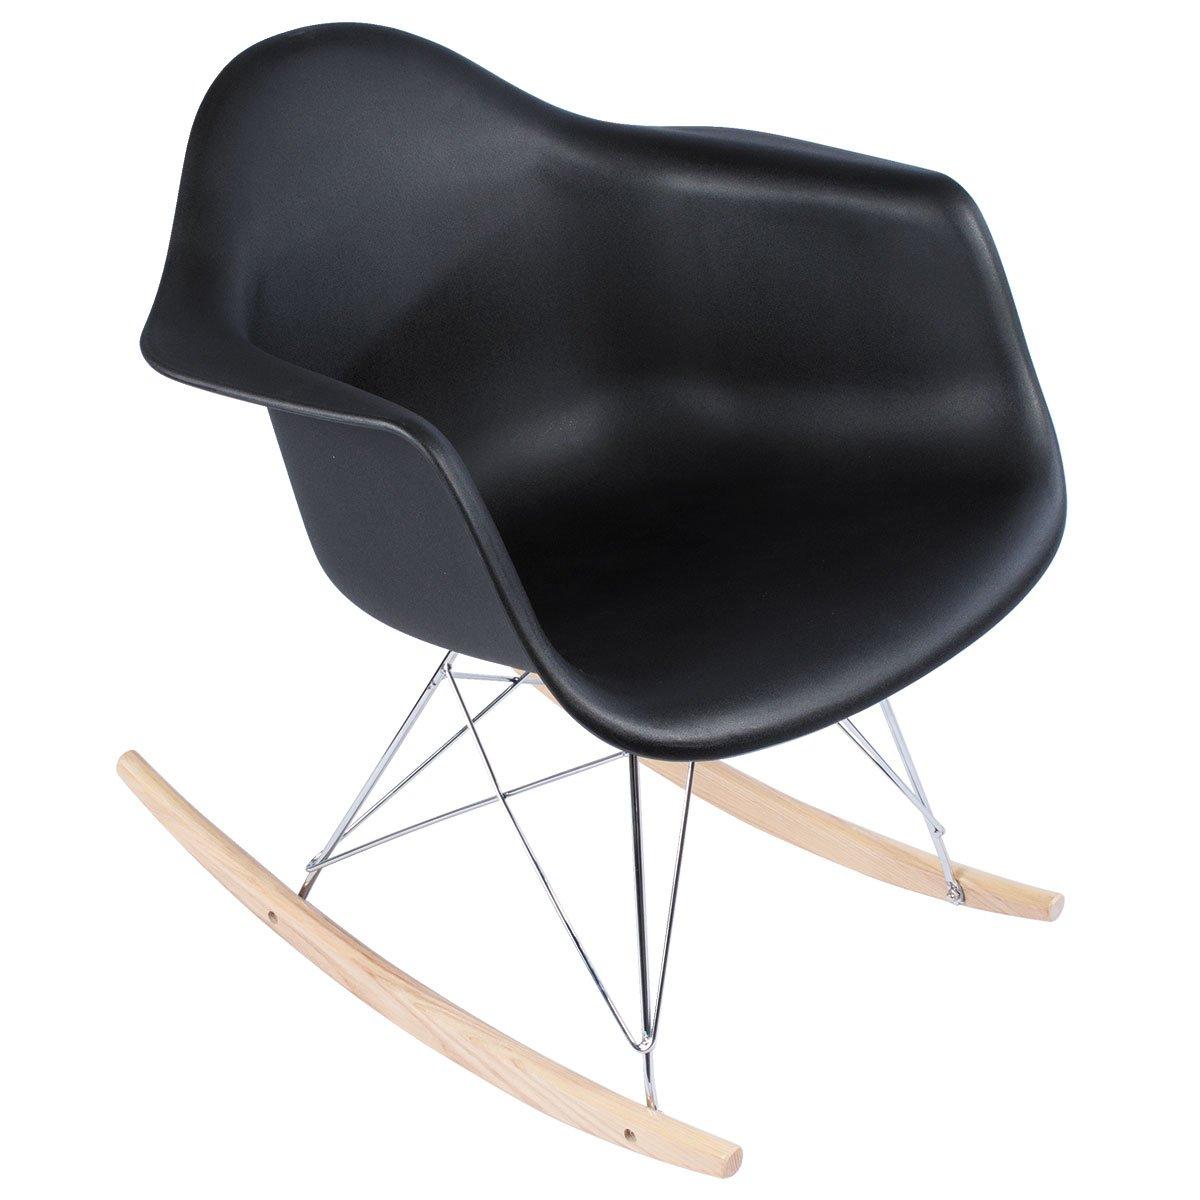 Phenomenal Amazon Com Polivaz Eames Style Mid Century Modern Rocking Inzonedesignstudio Interior Chair Design Inzonedesignstudiocom